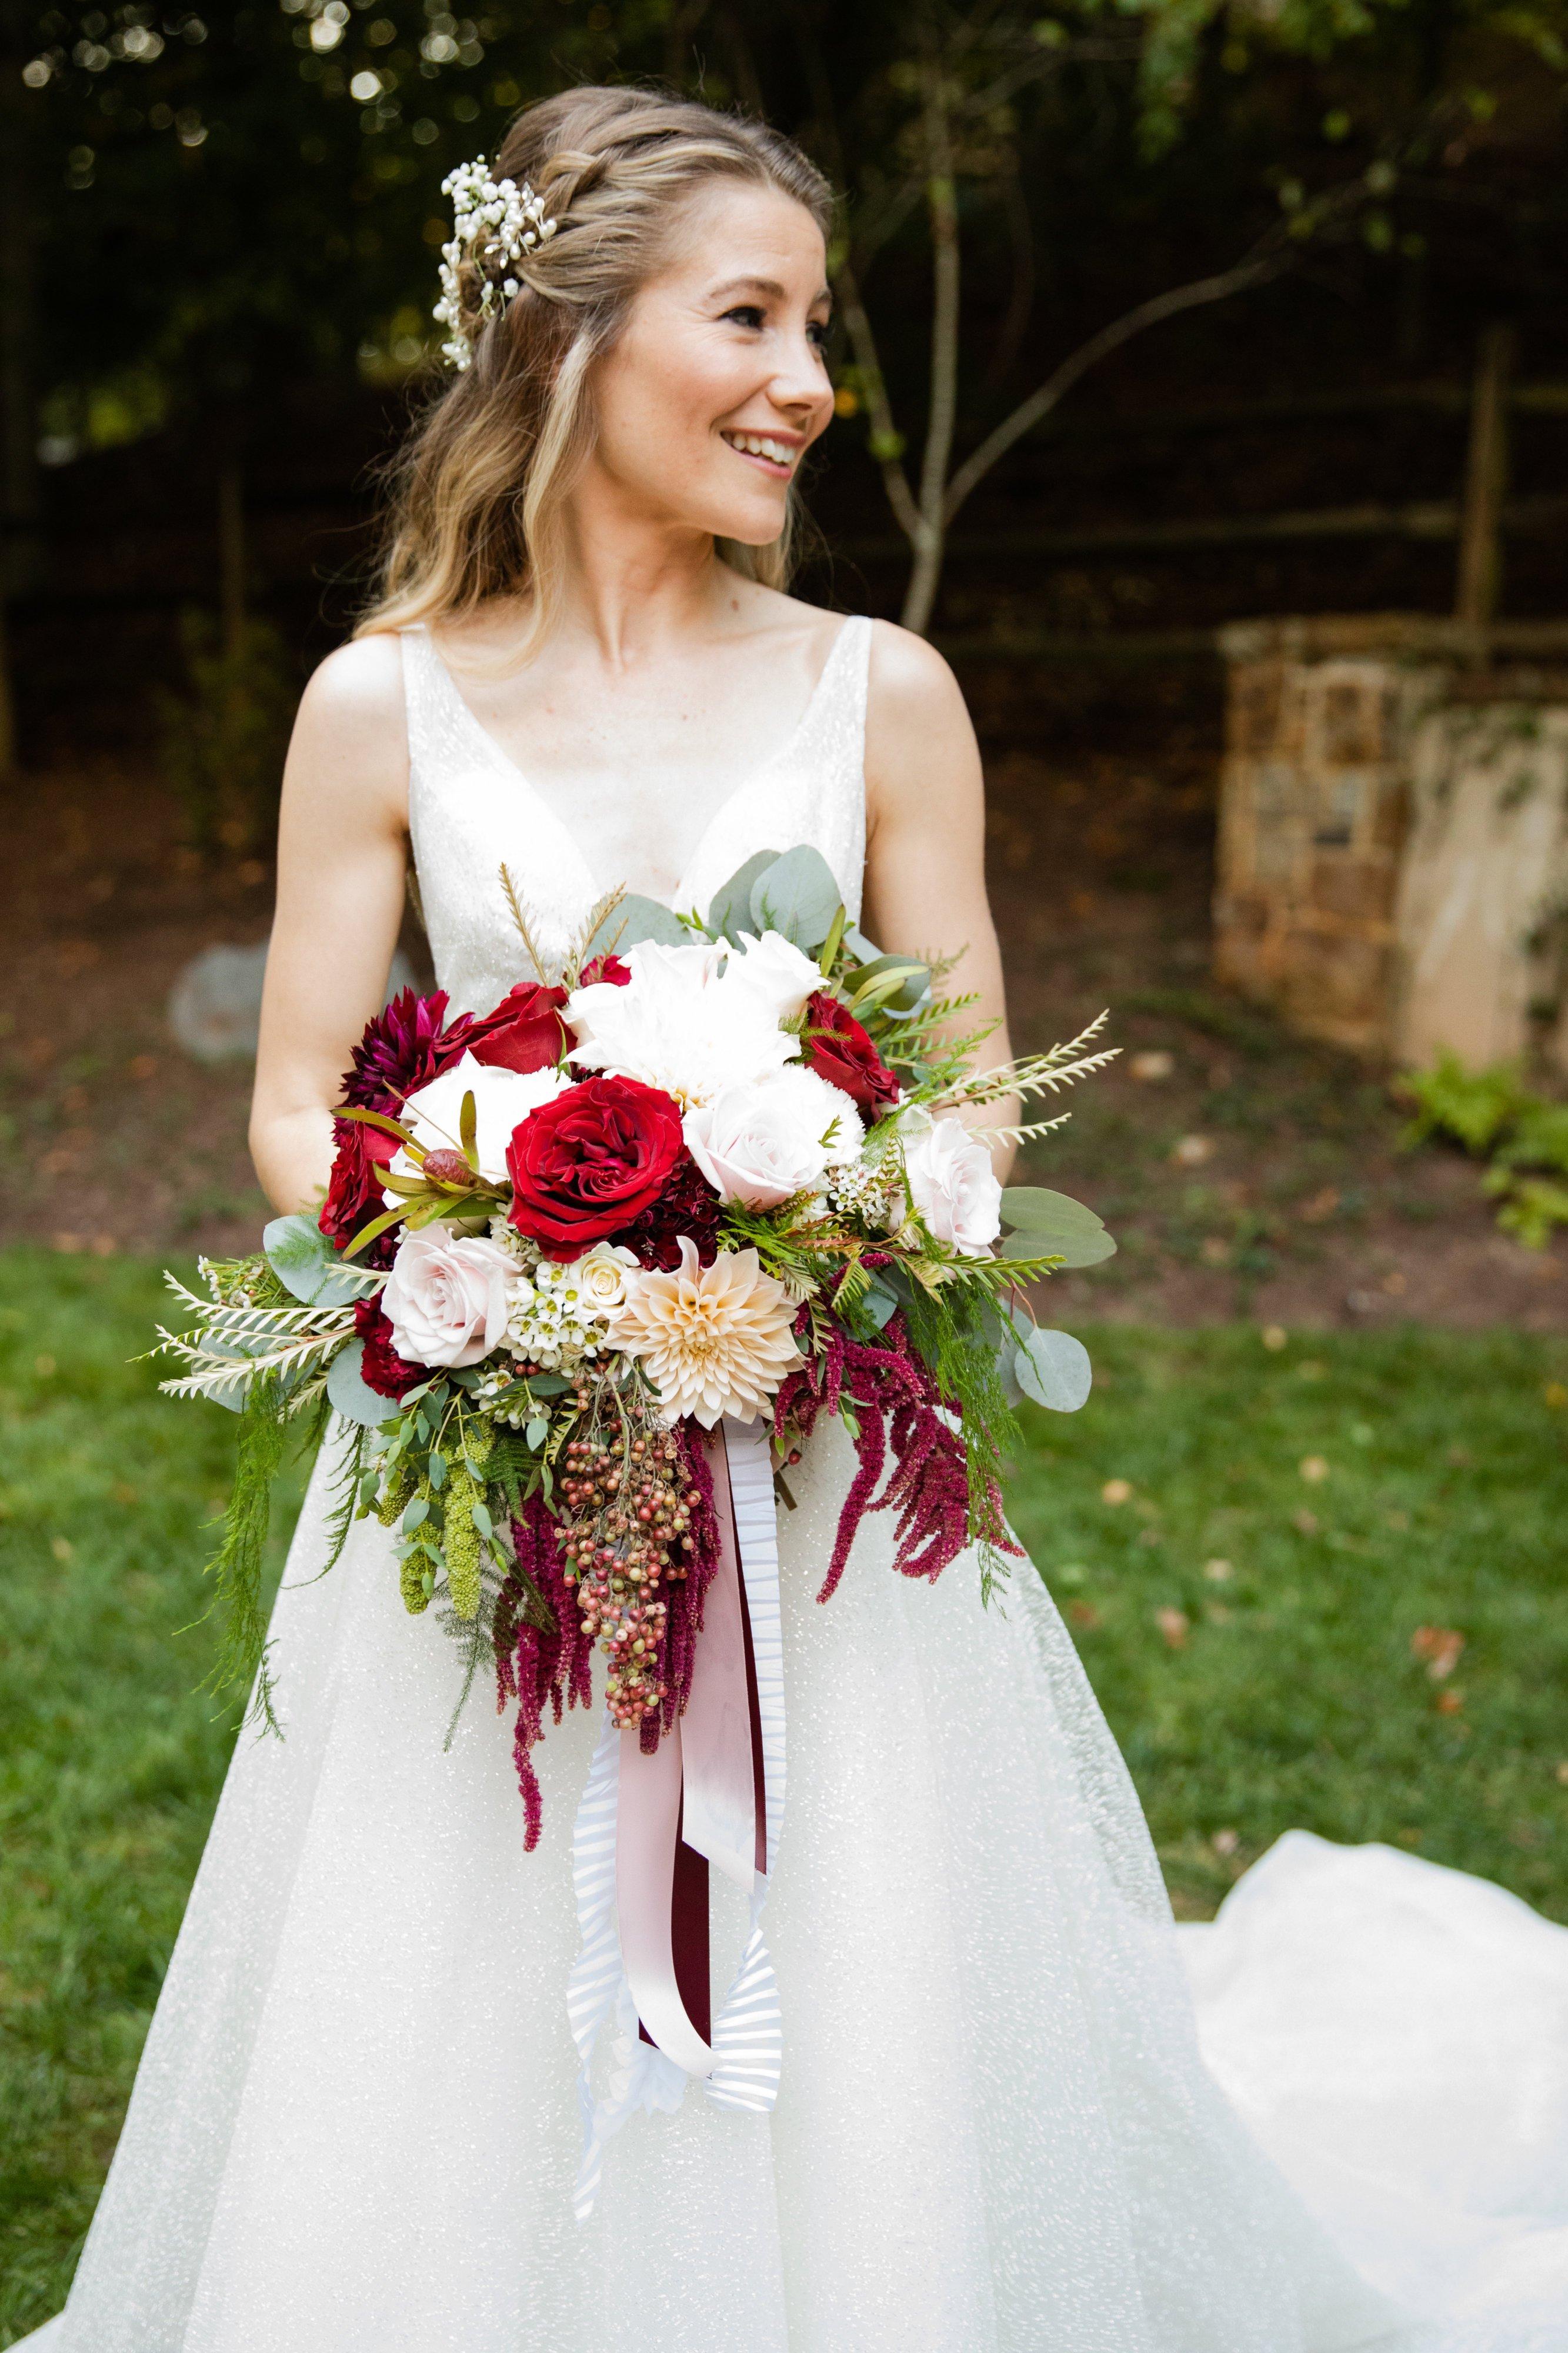 StefanieKamermanPhotography-MelanieandBenjamin-Wedding-Bethesda,MD-2019-10-12-143